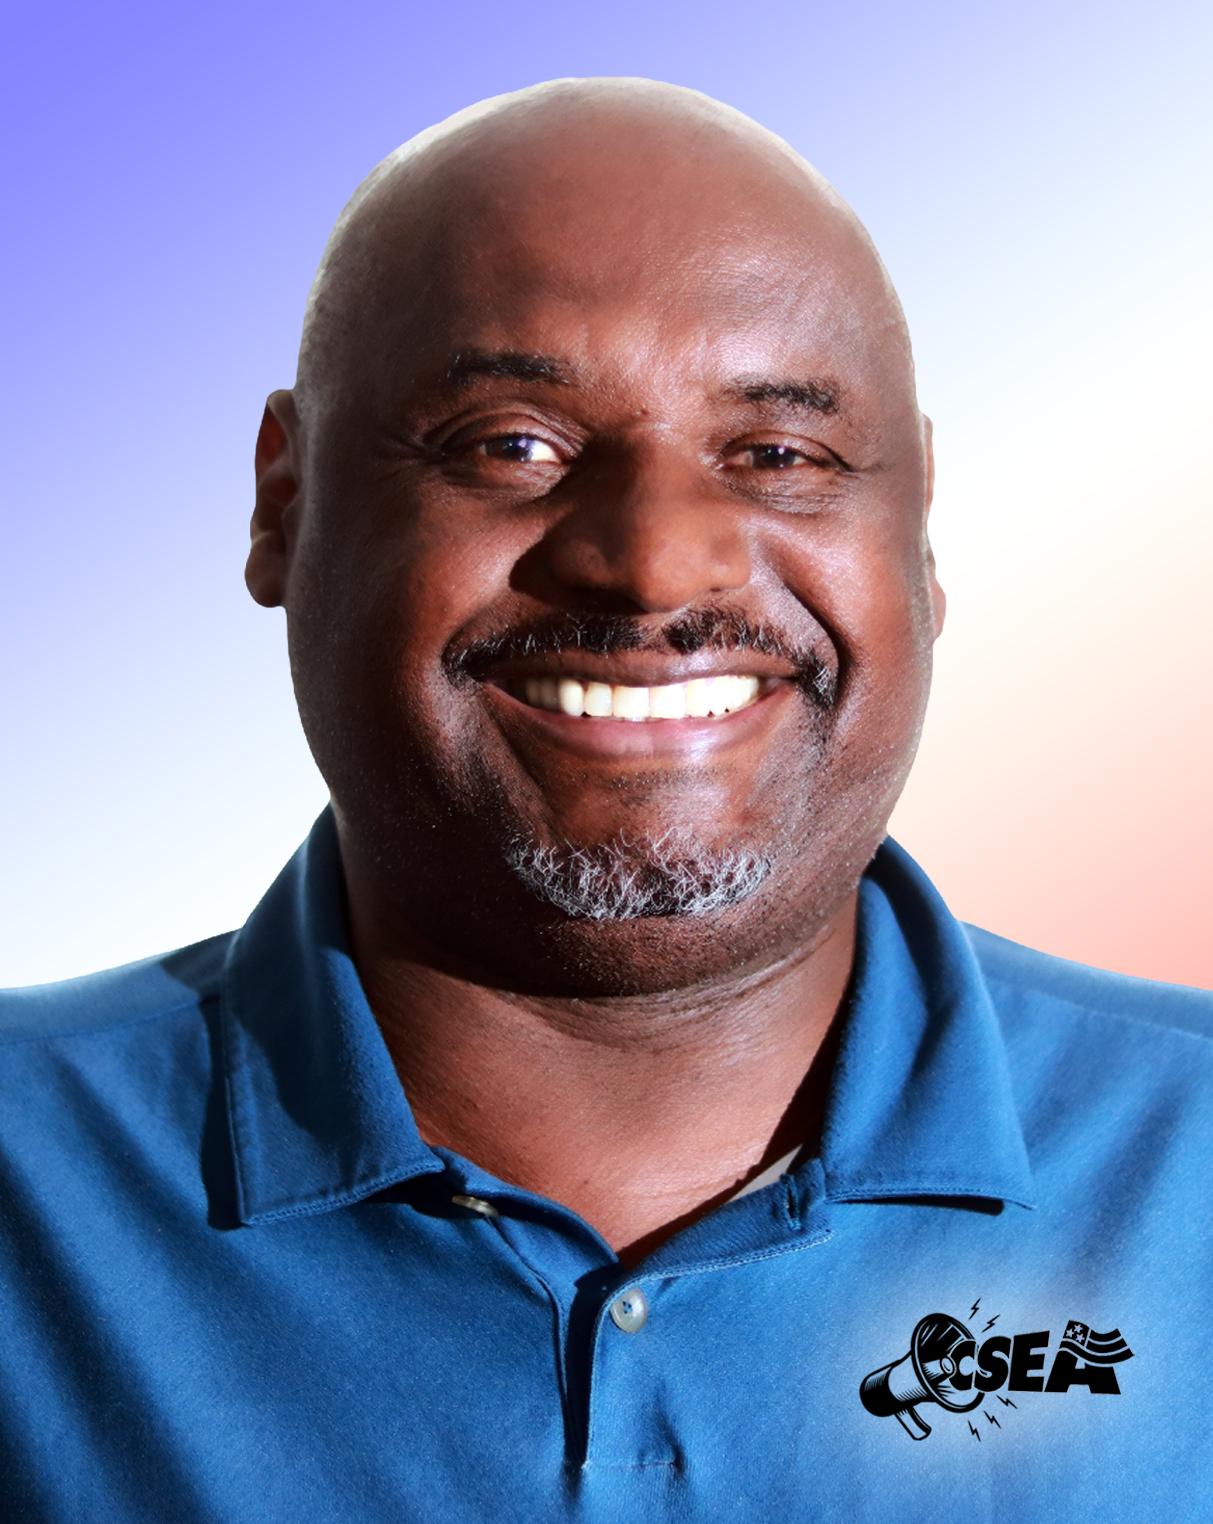 KelvinLewis - CSEA Local 830 Vice President